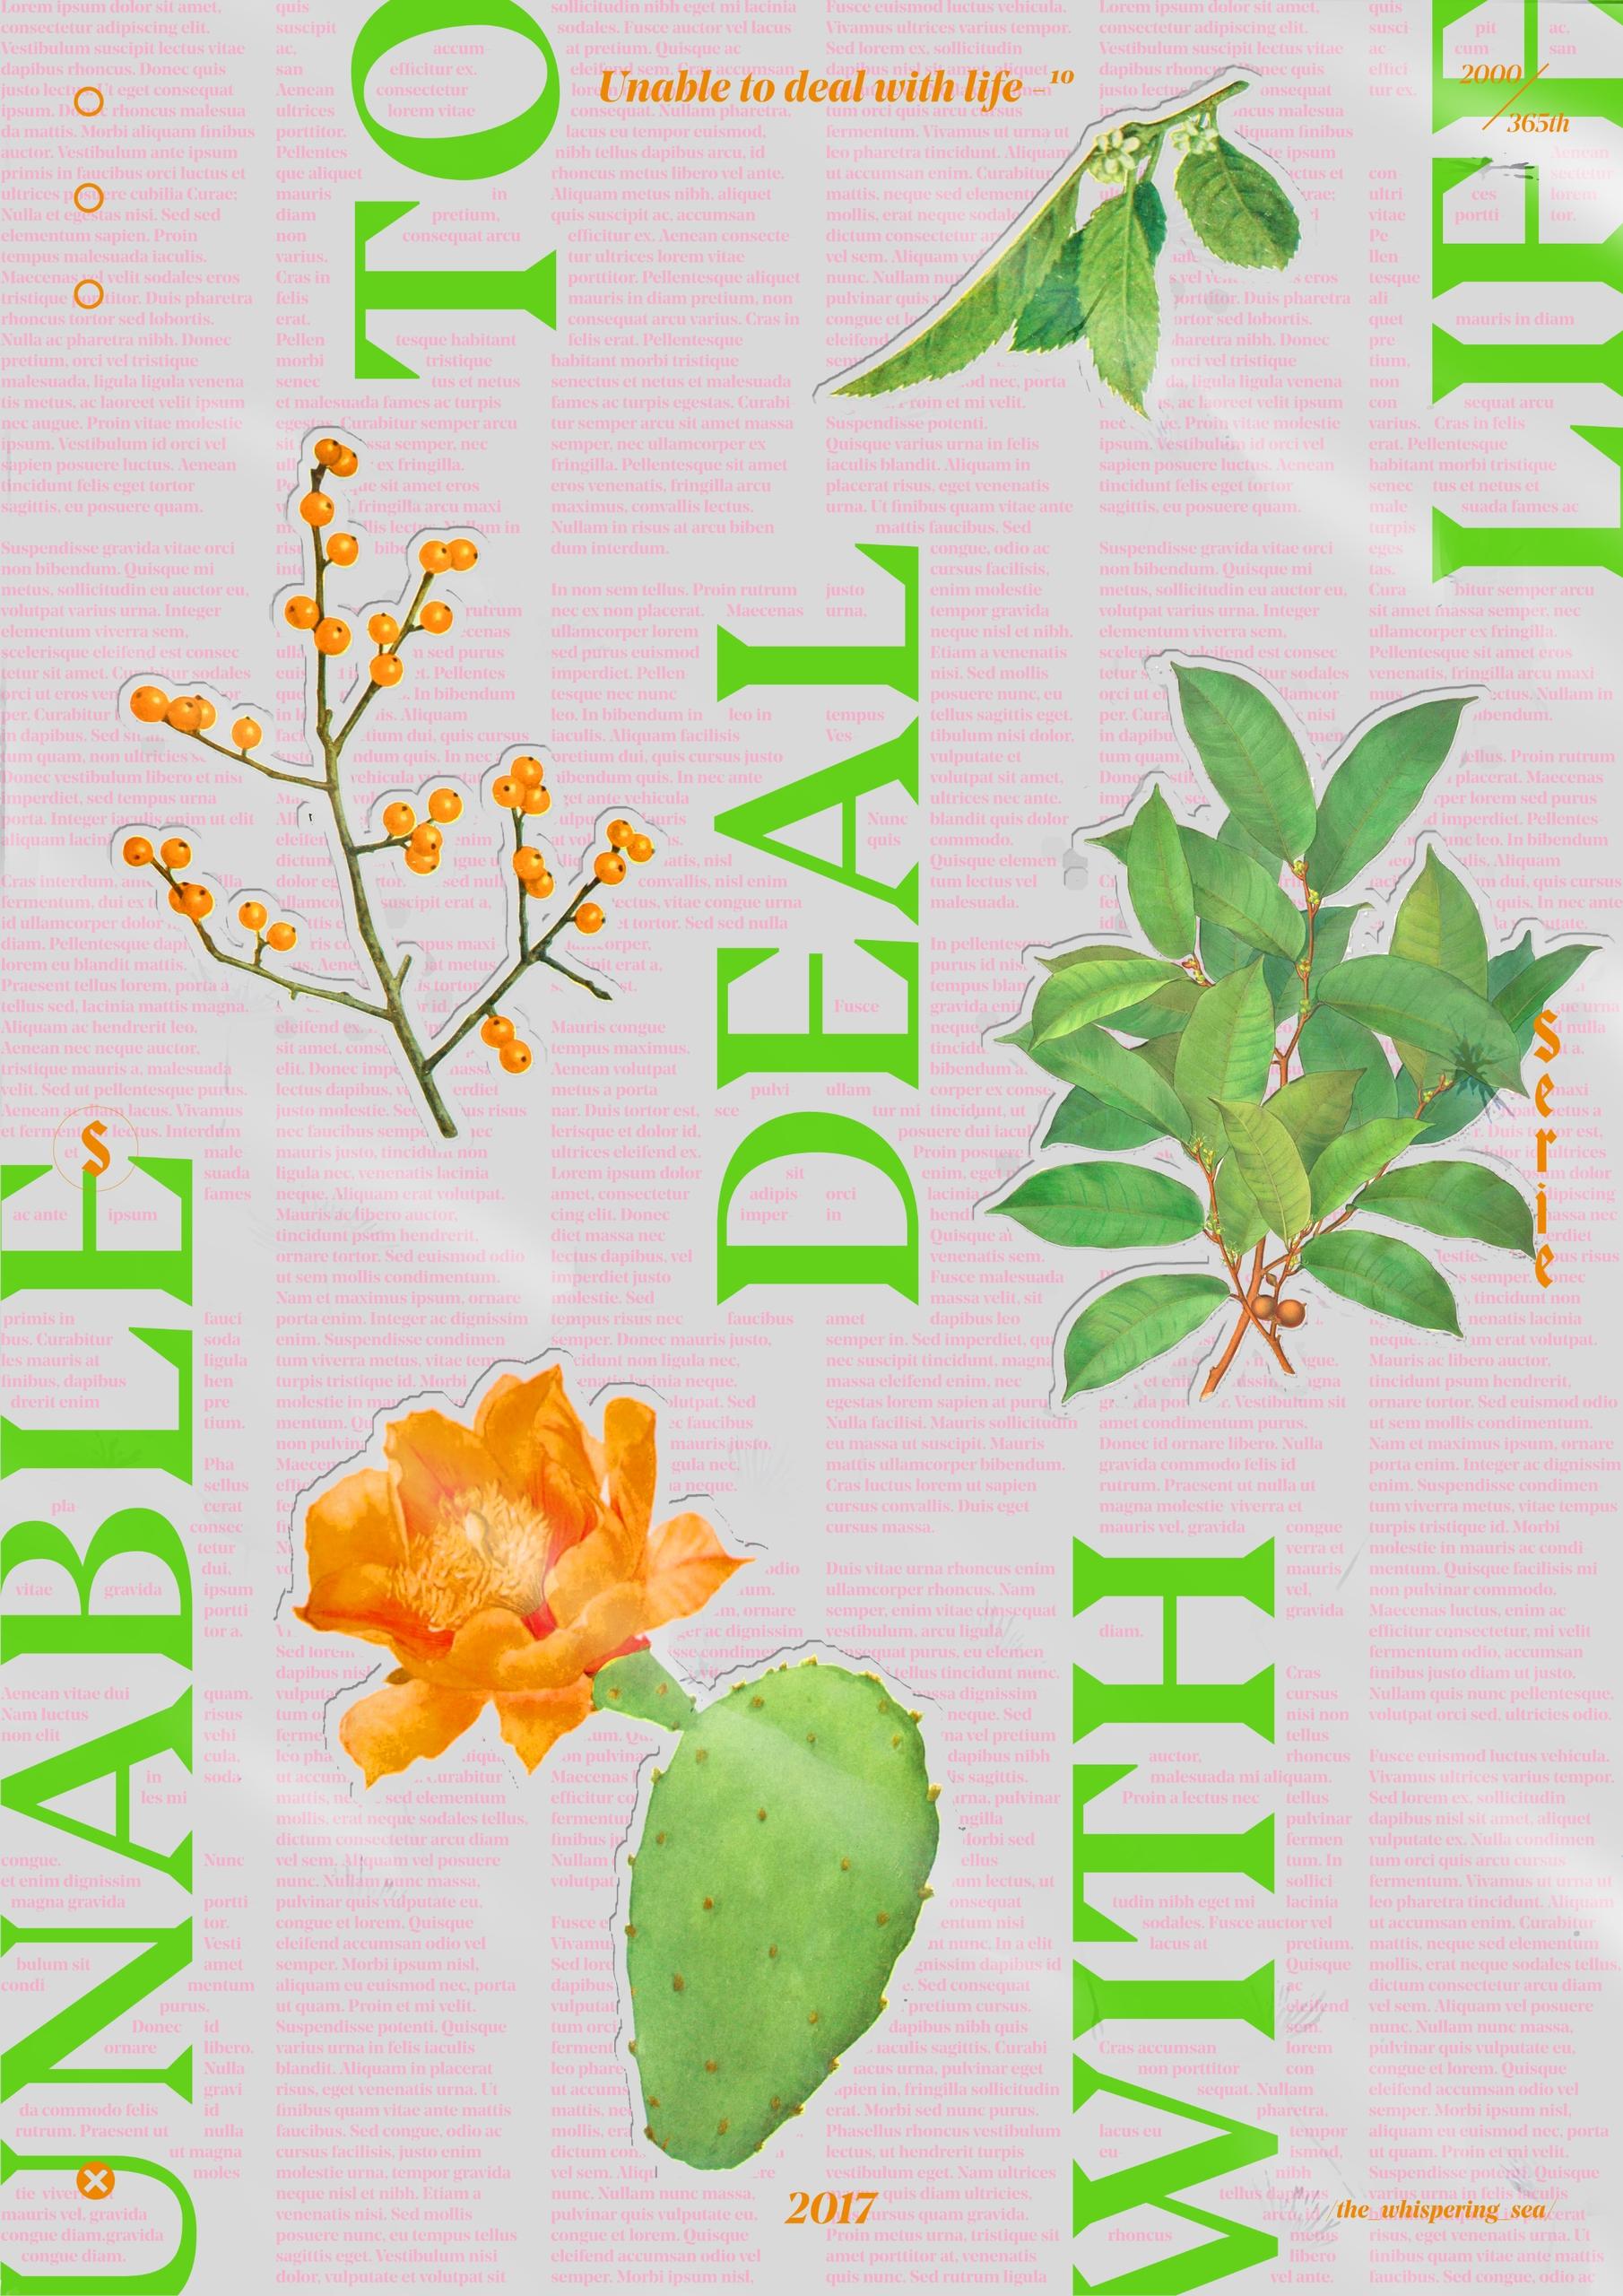 Life - poster, nature, book, cover - torresmilka2004 | ello